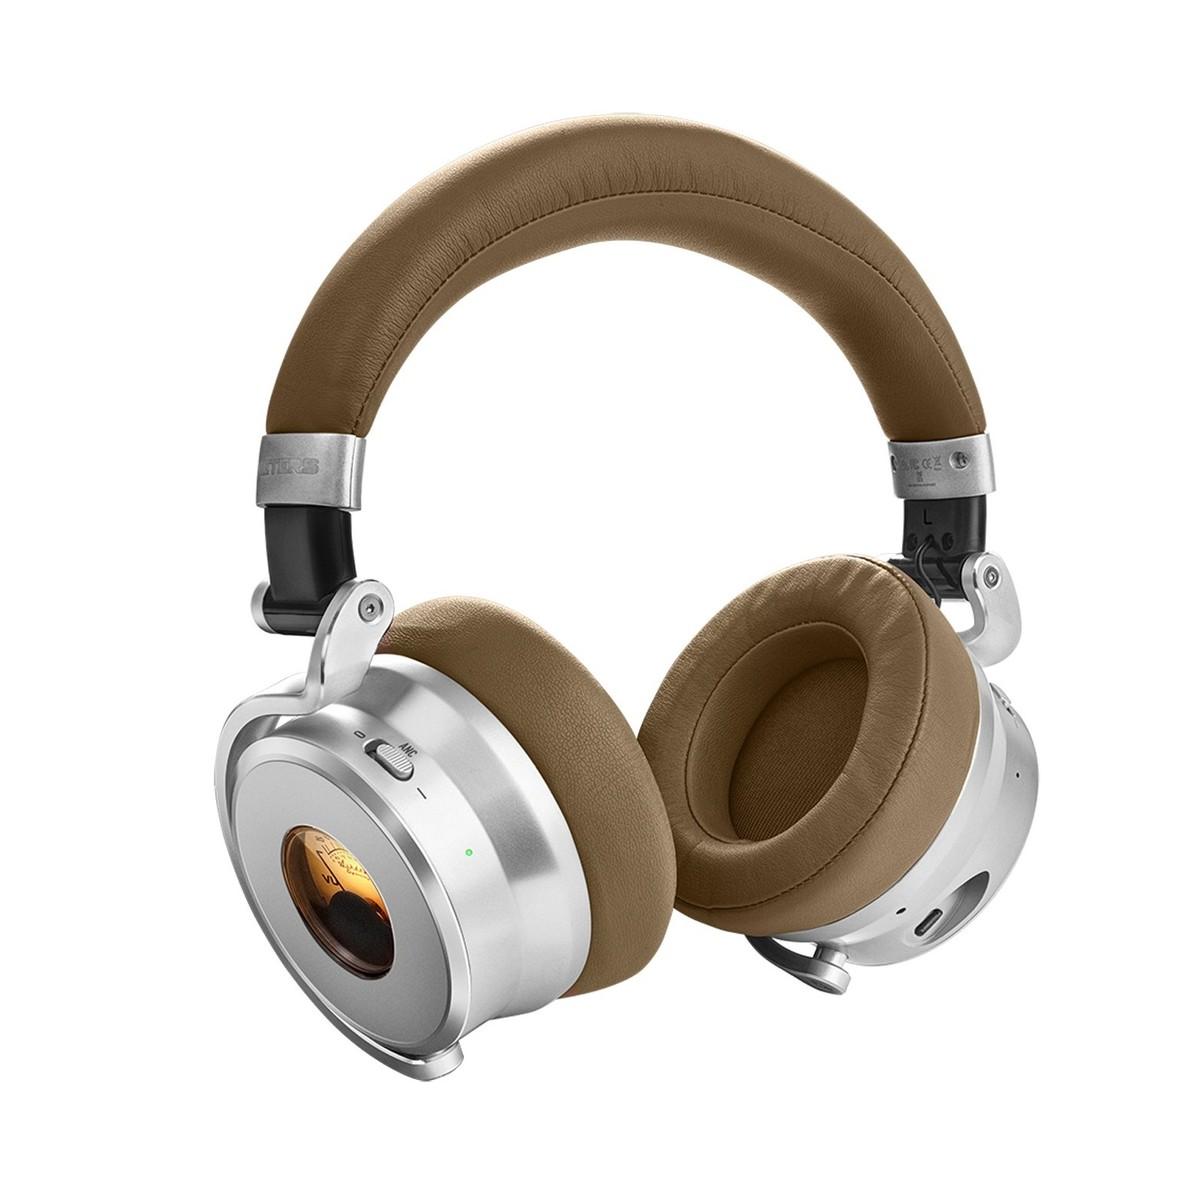 f8b616b3f42 ... Meter OV-1-B Bluetooth Over Ear Headphones, Tan - Angle ...